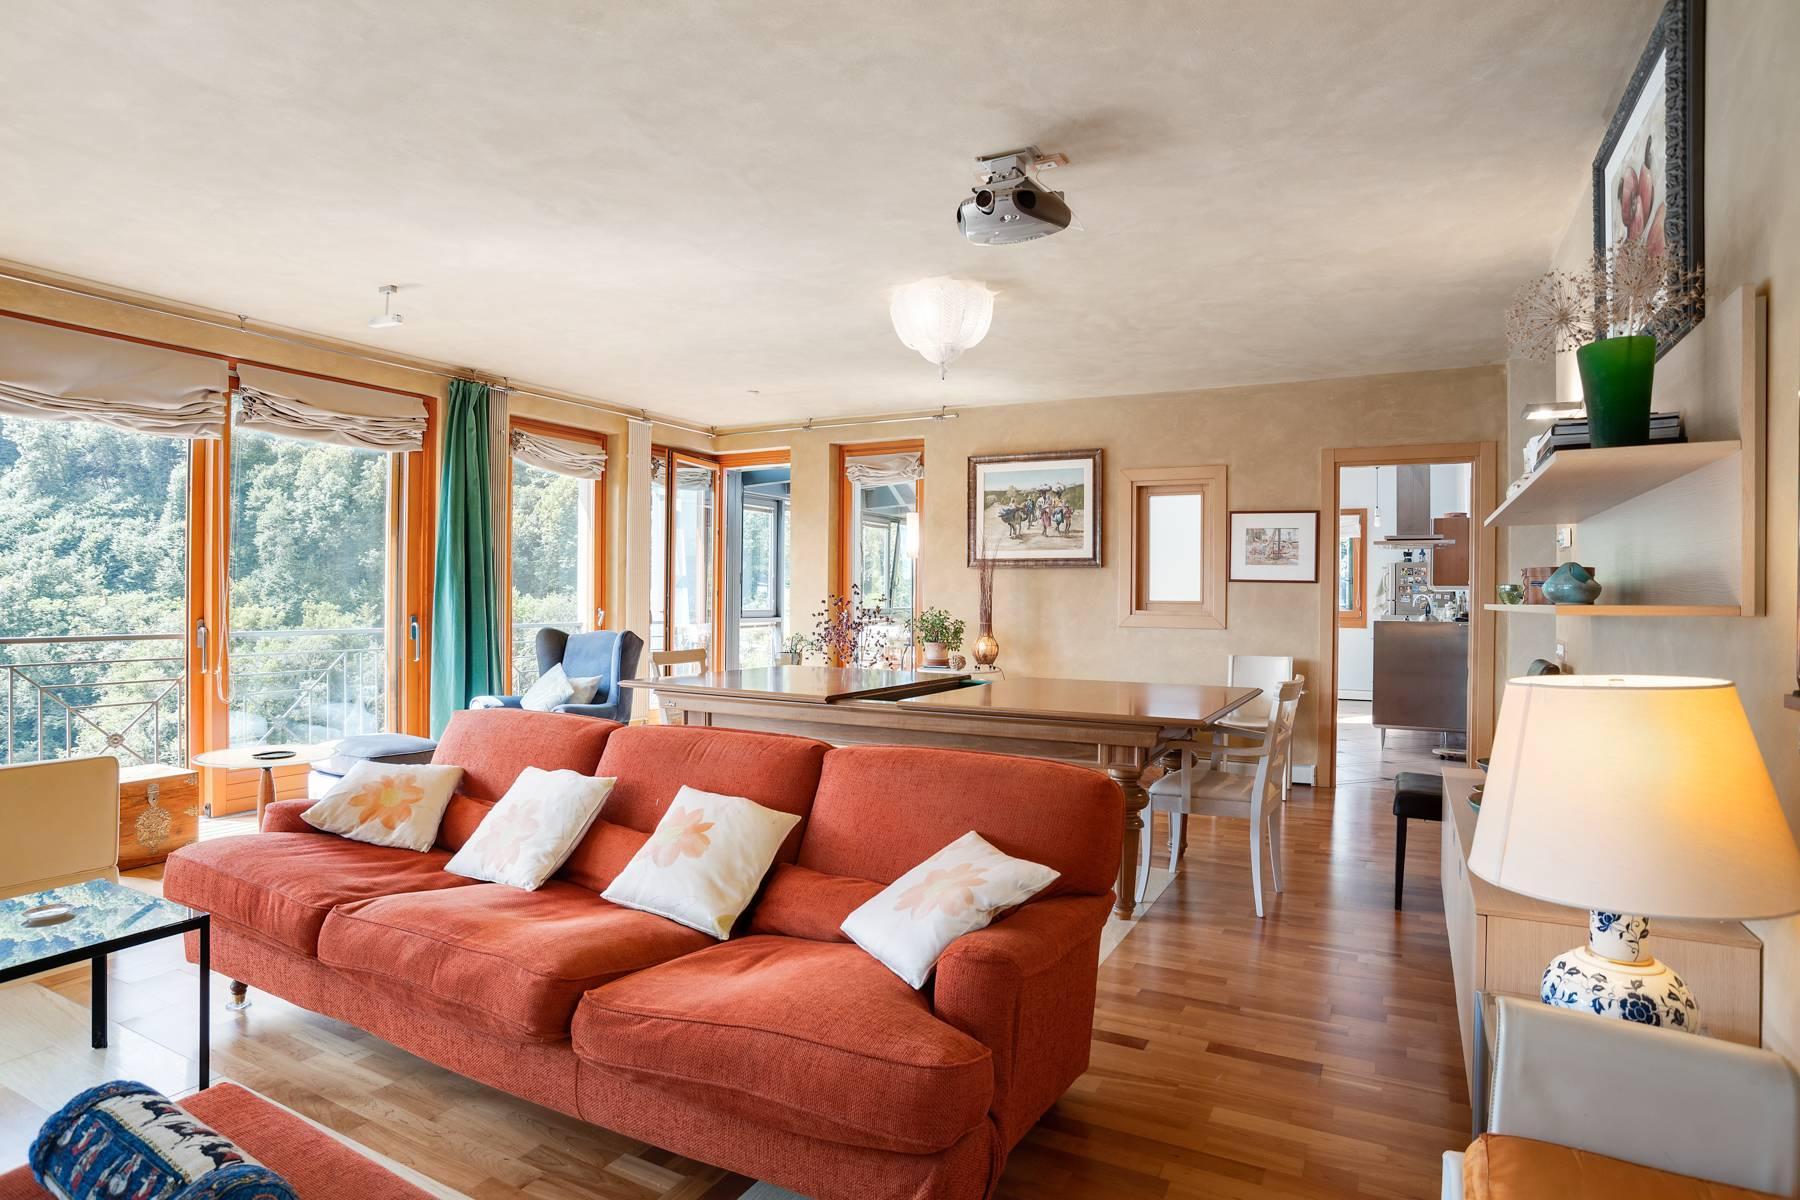 Splendida villa moderna sulla collina soleggiata sopra Argegno - 15